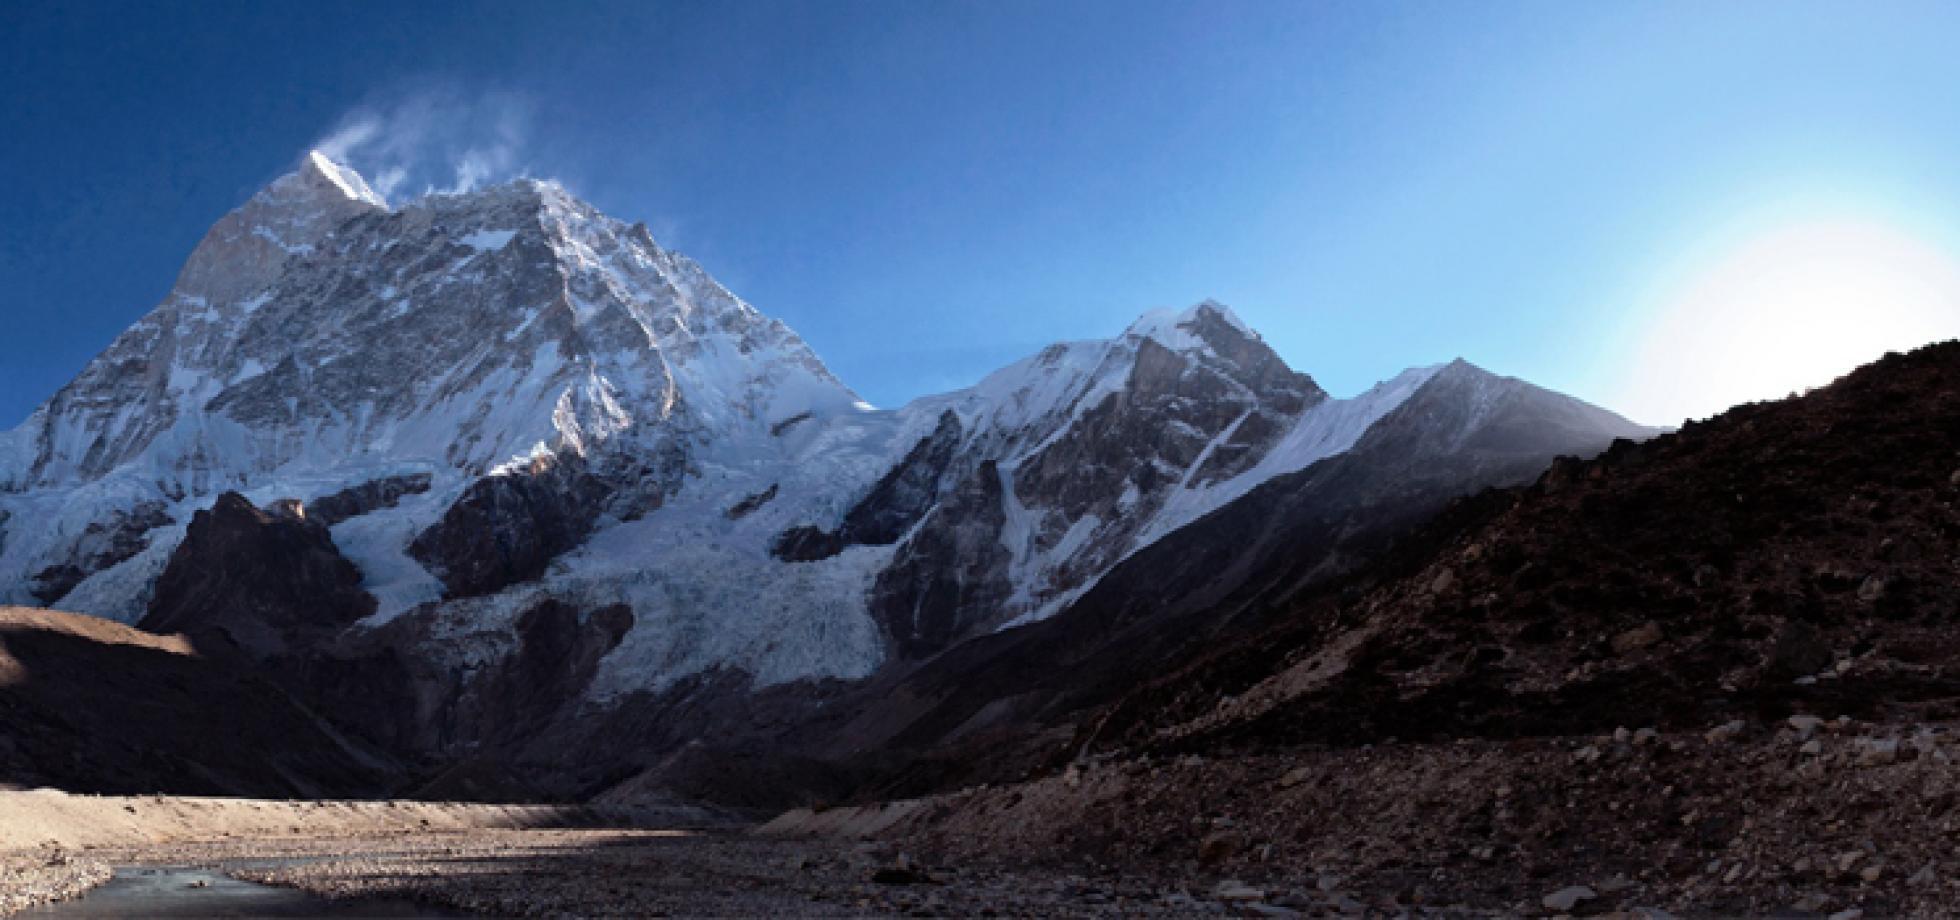 Makalu Barun National Park nationale parken in Nepal